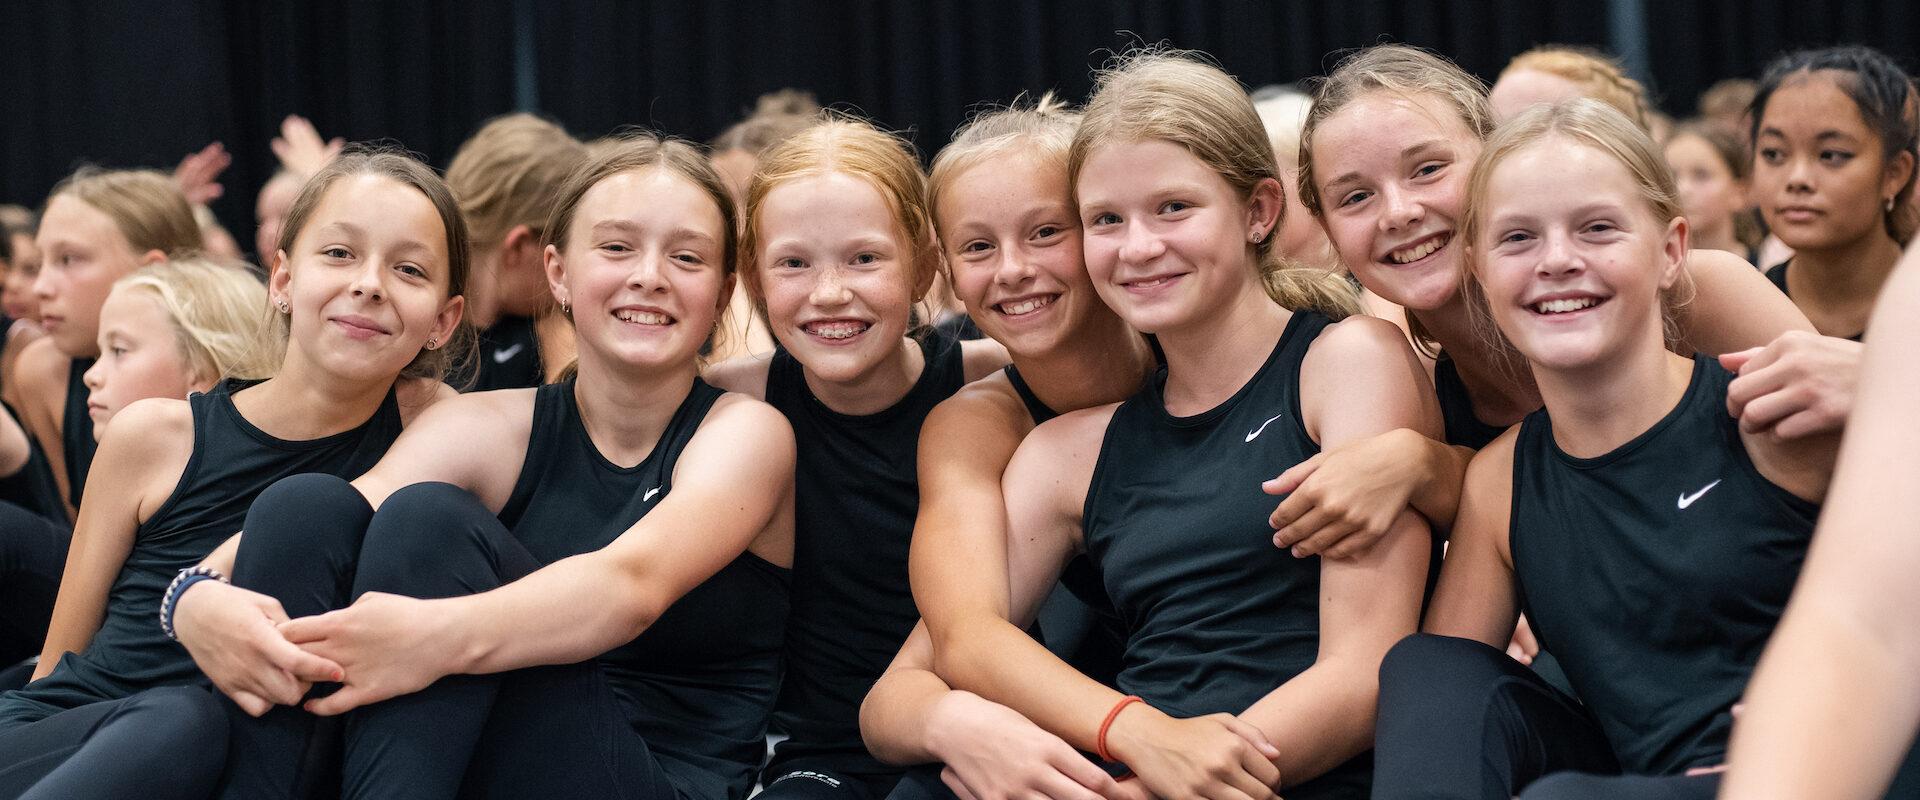 pigecamp sorø gymnastikefterskole